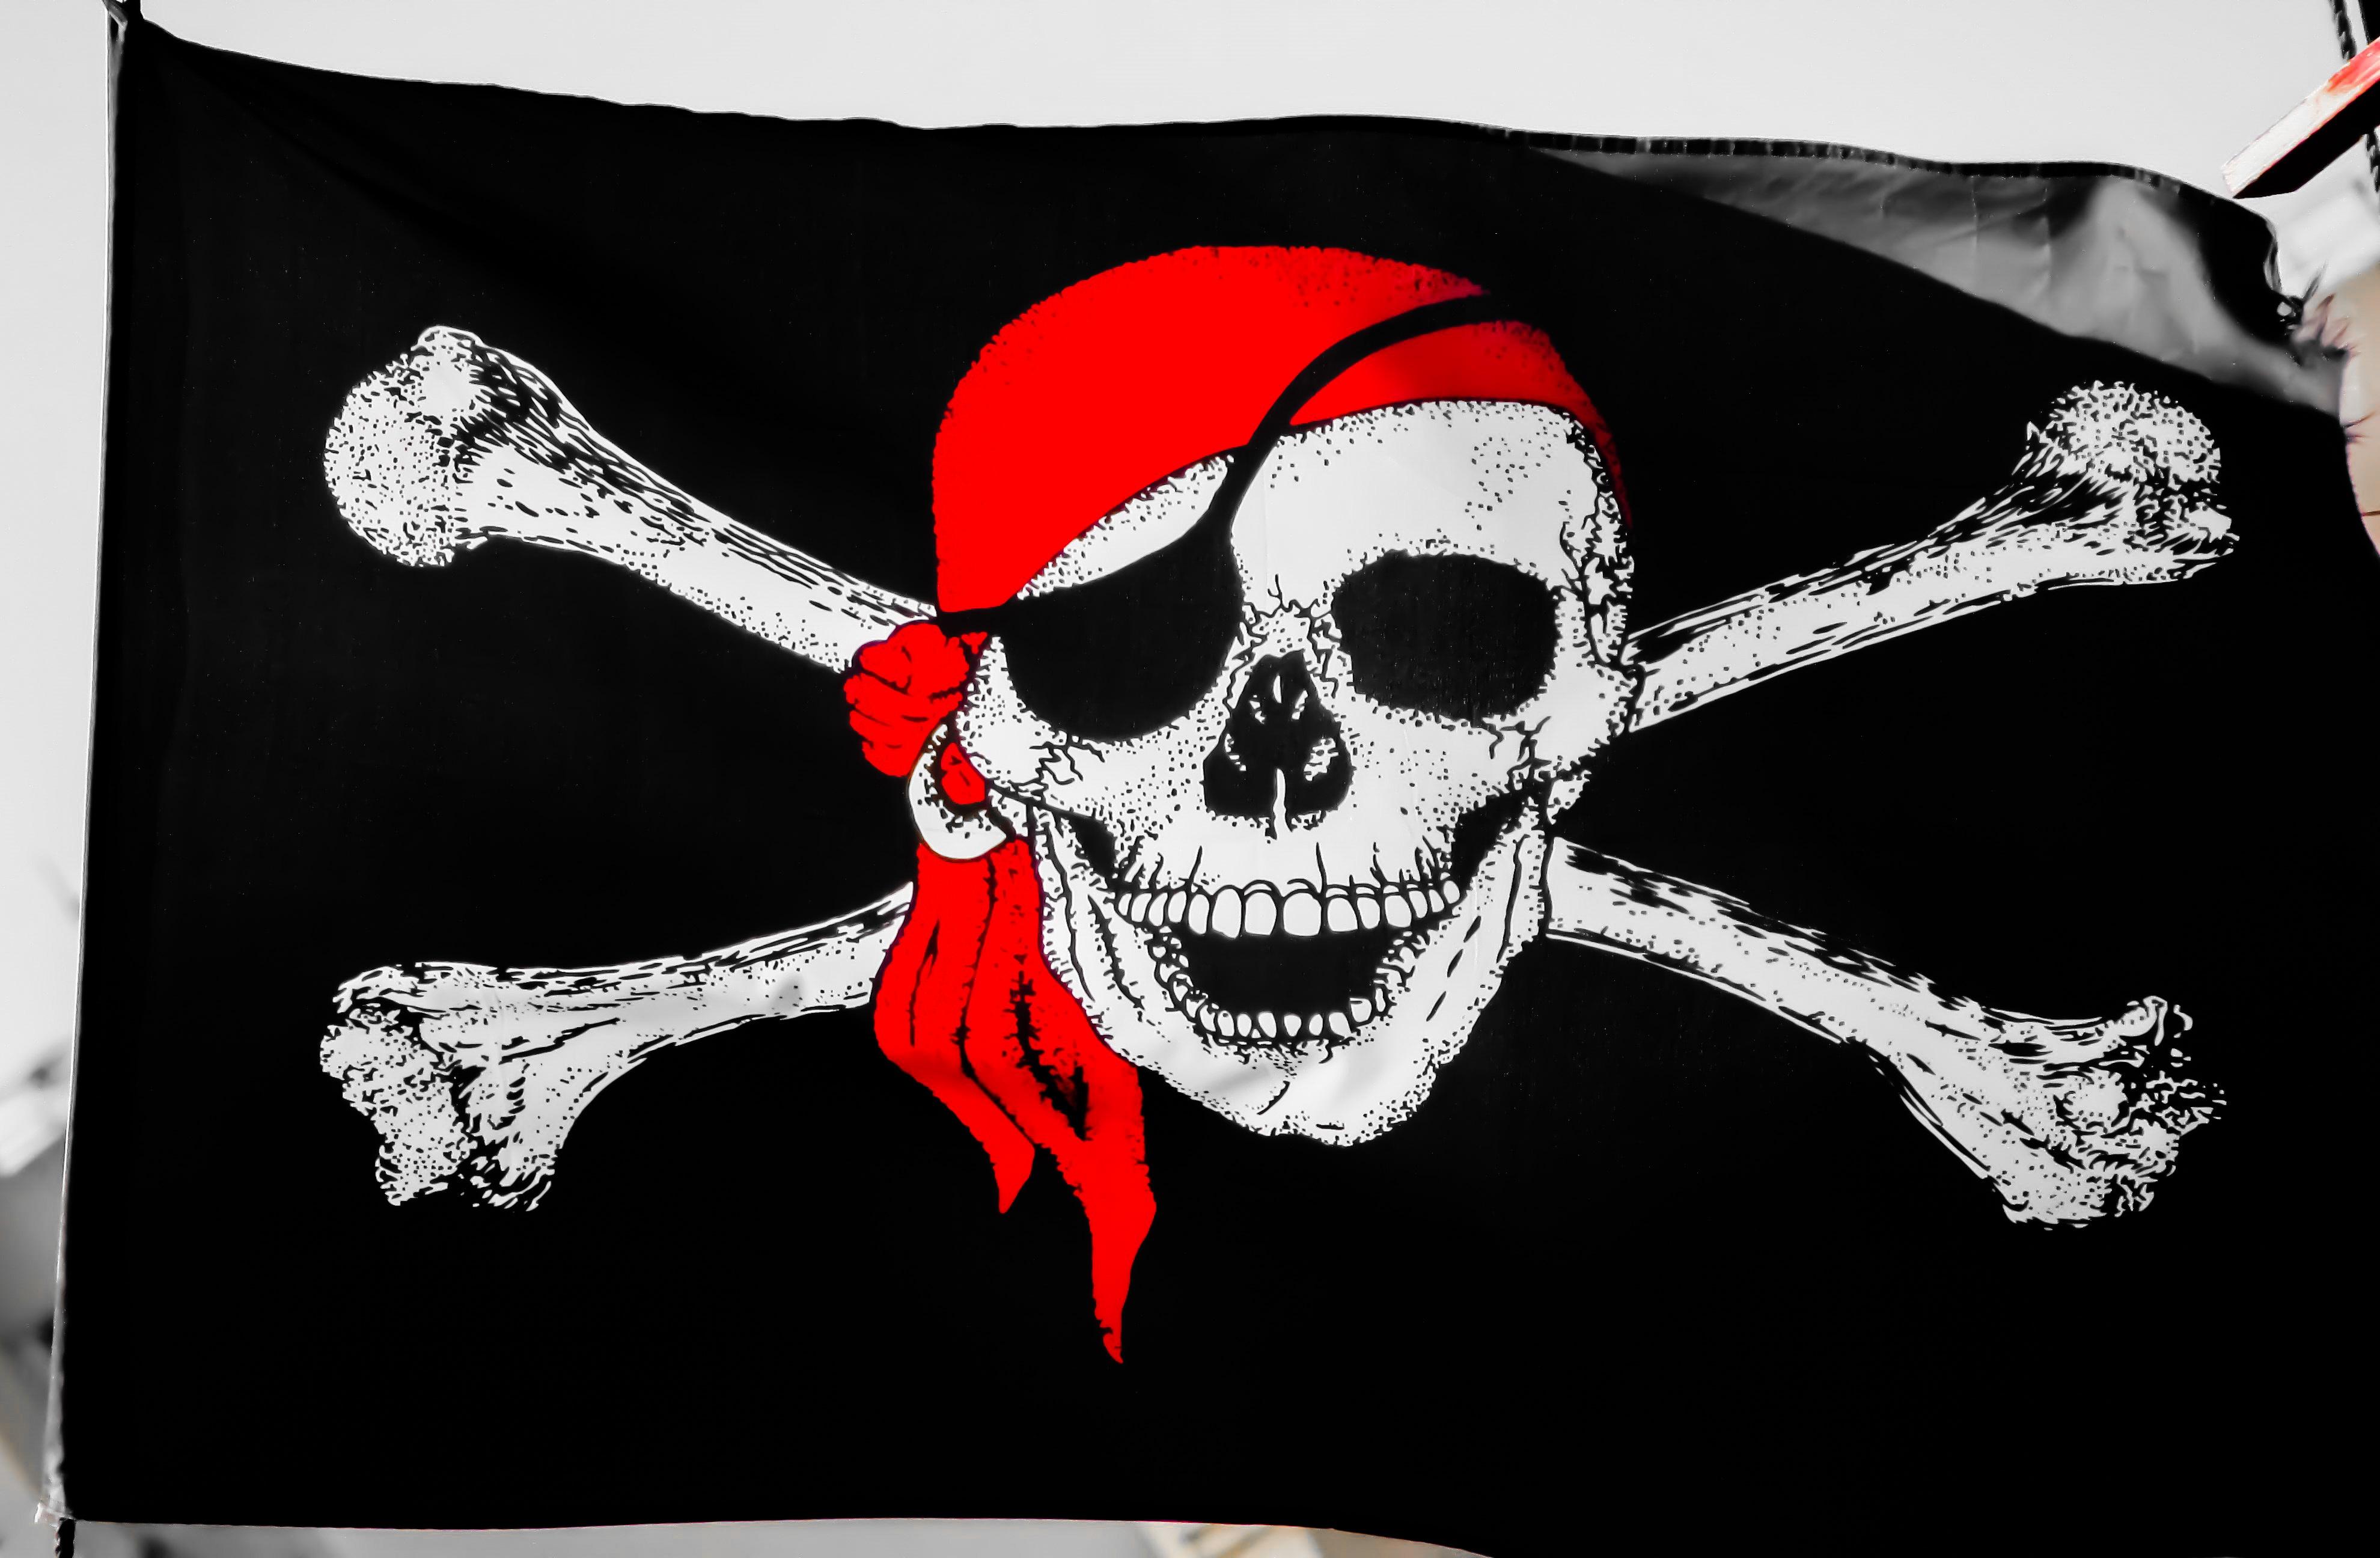 free images symbol flag clothing black illustration